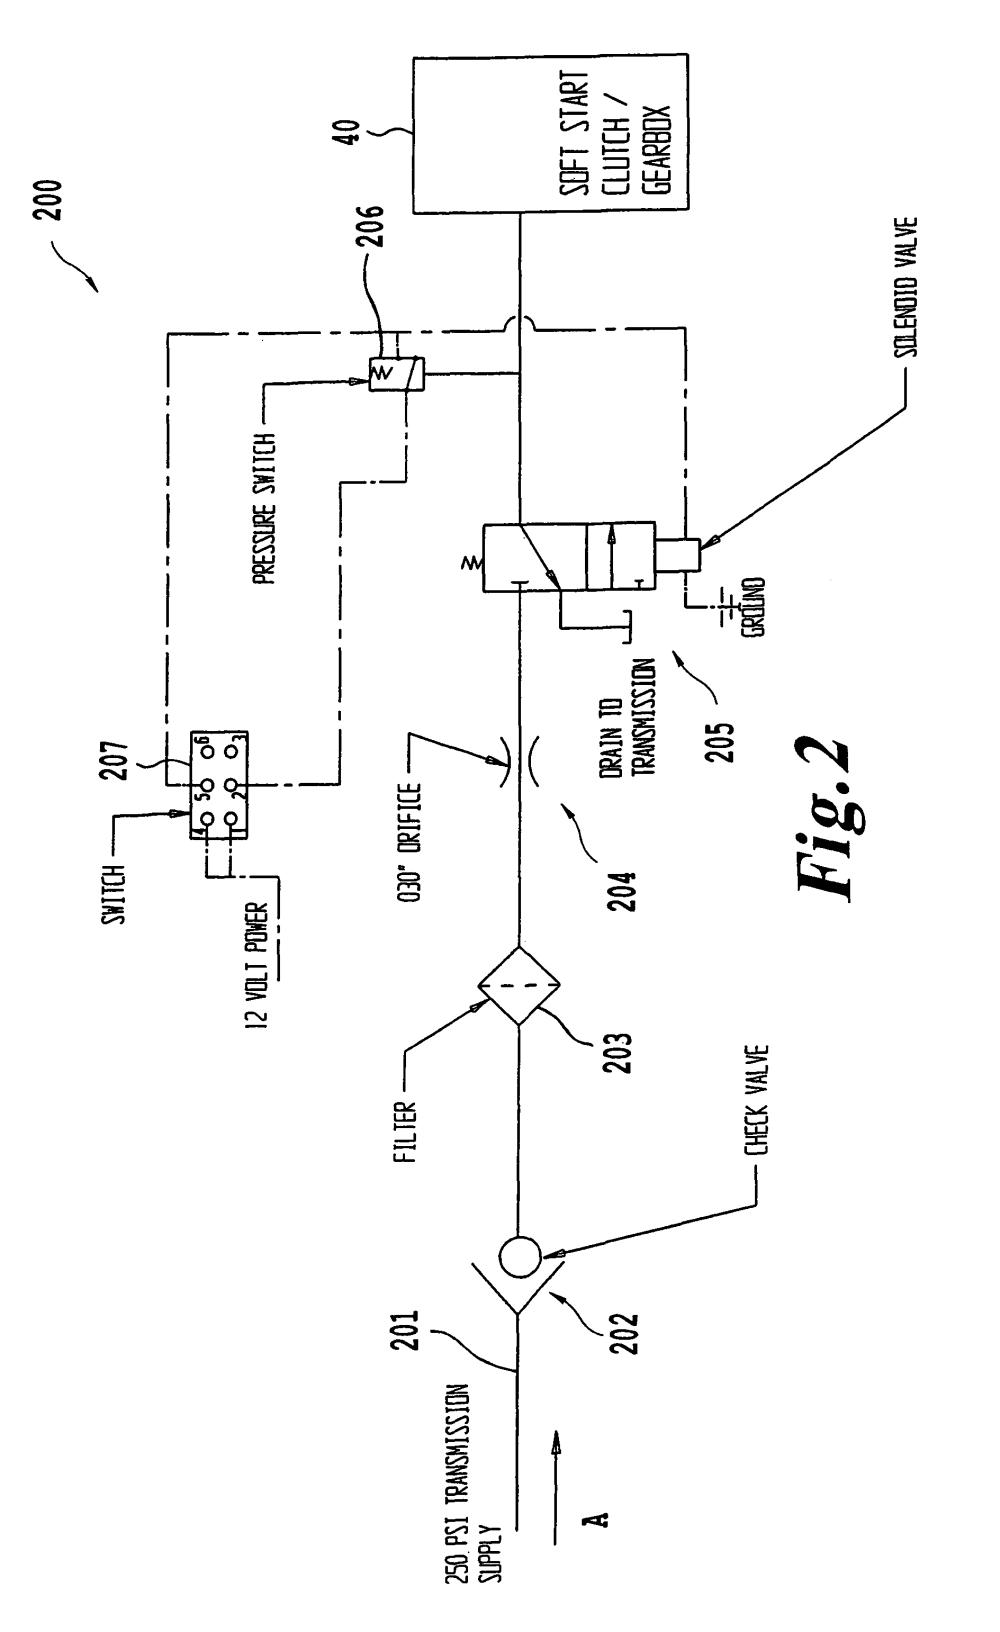 medium resolution of pto wiring diagram wiring diagram blogs muncie pto wiring diagram ford chelsea pto wiring diagram wiring